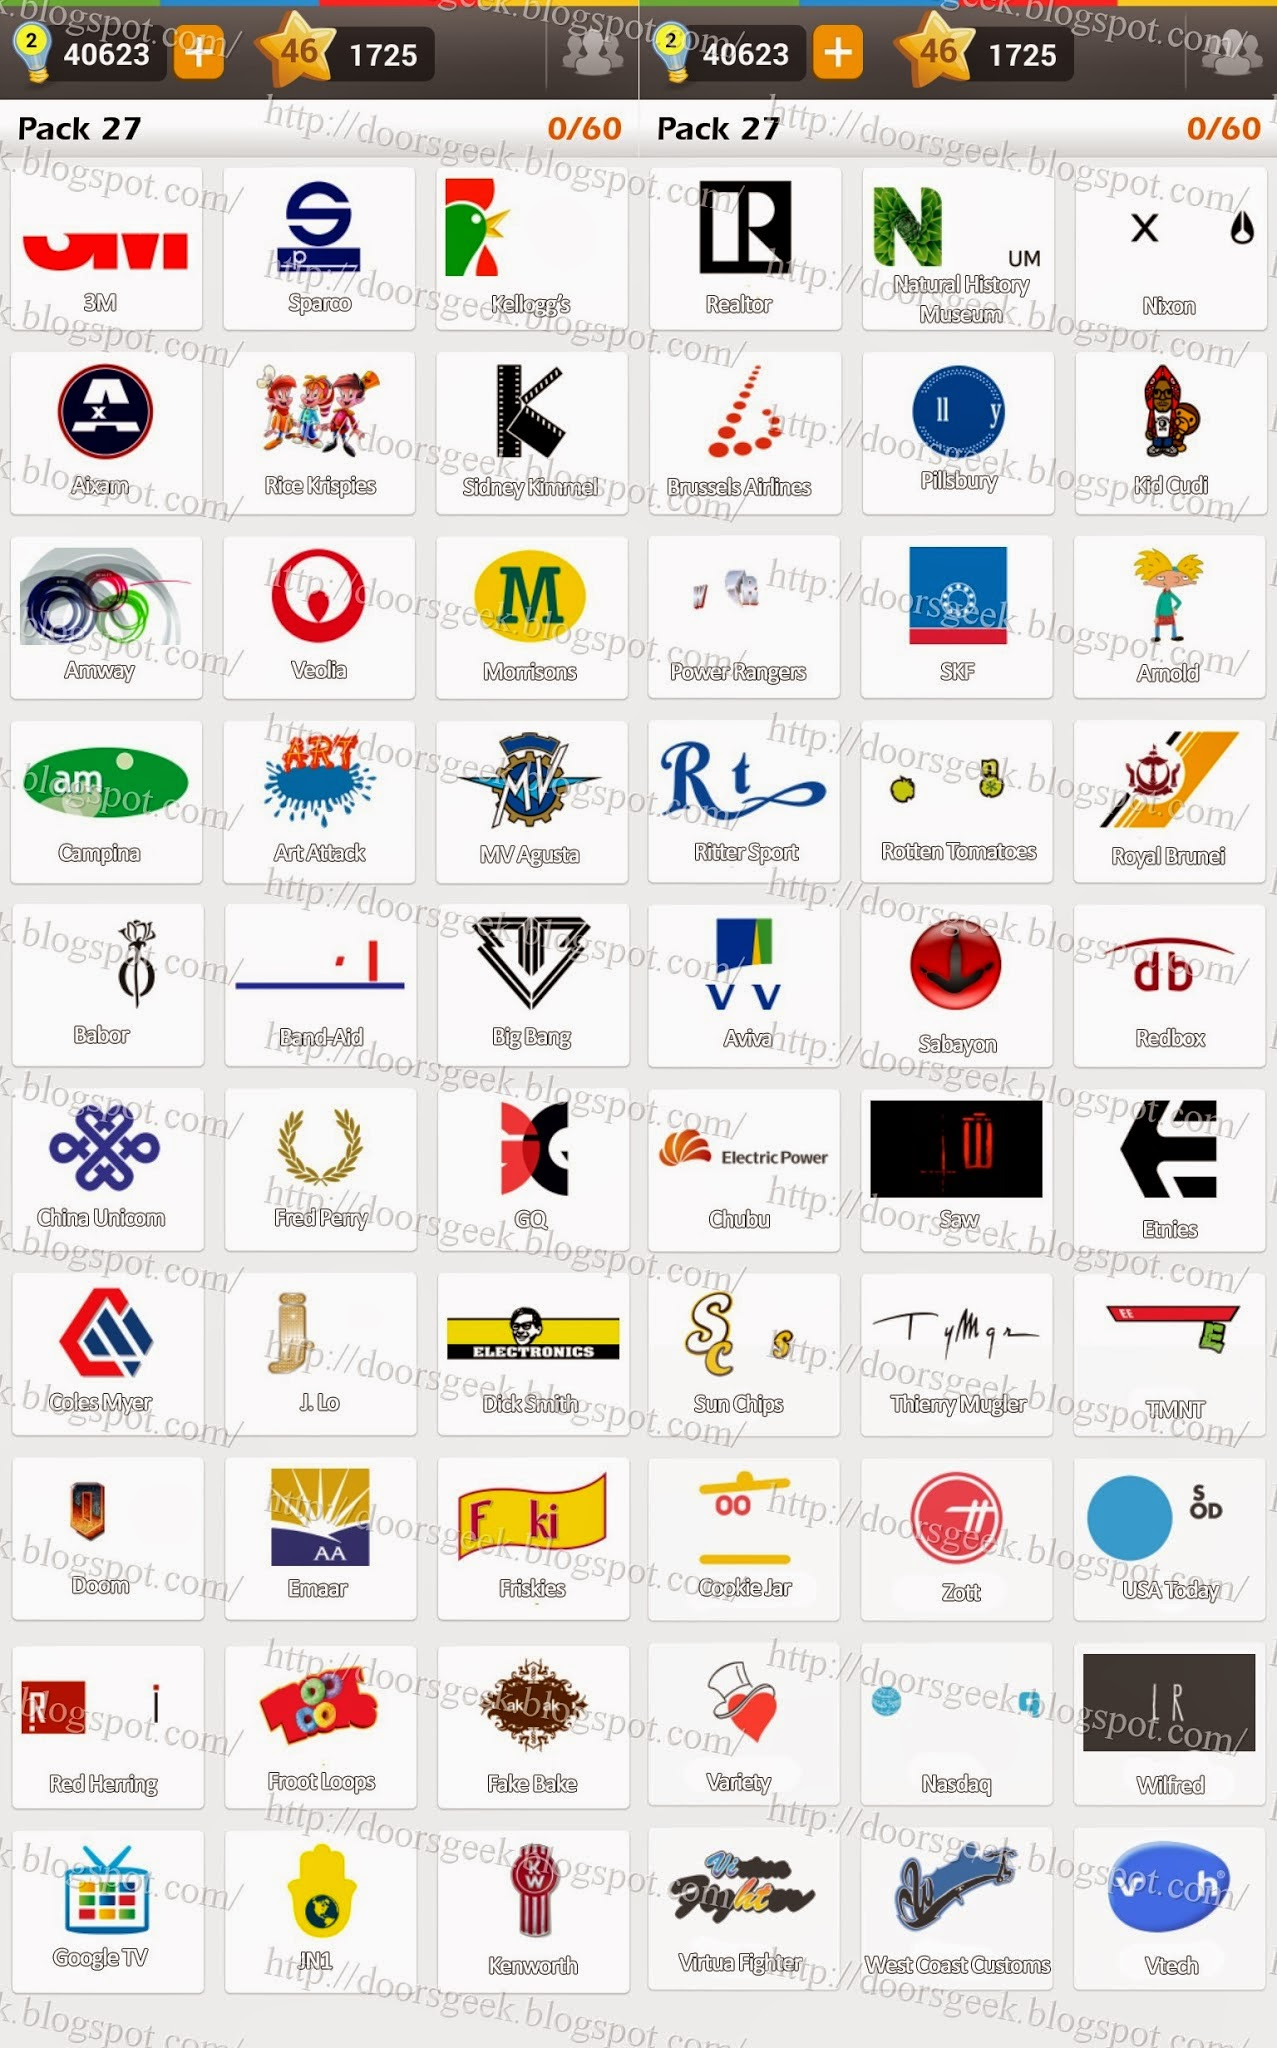 Logo game guess the brand regular pack 6 doors geek - 05 19 14 Doors Geek